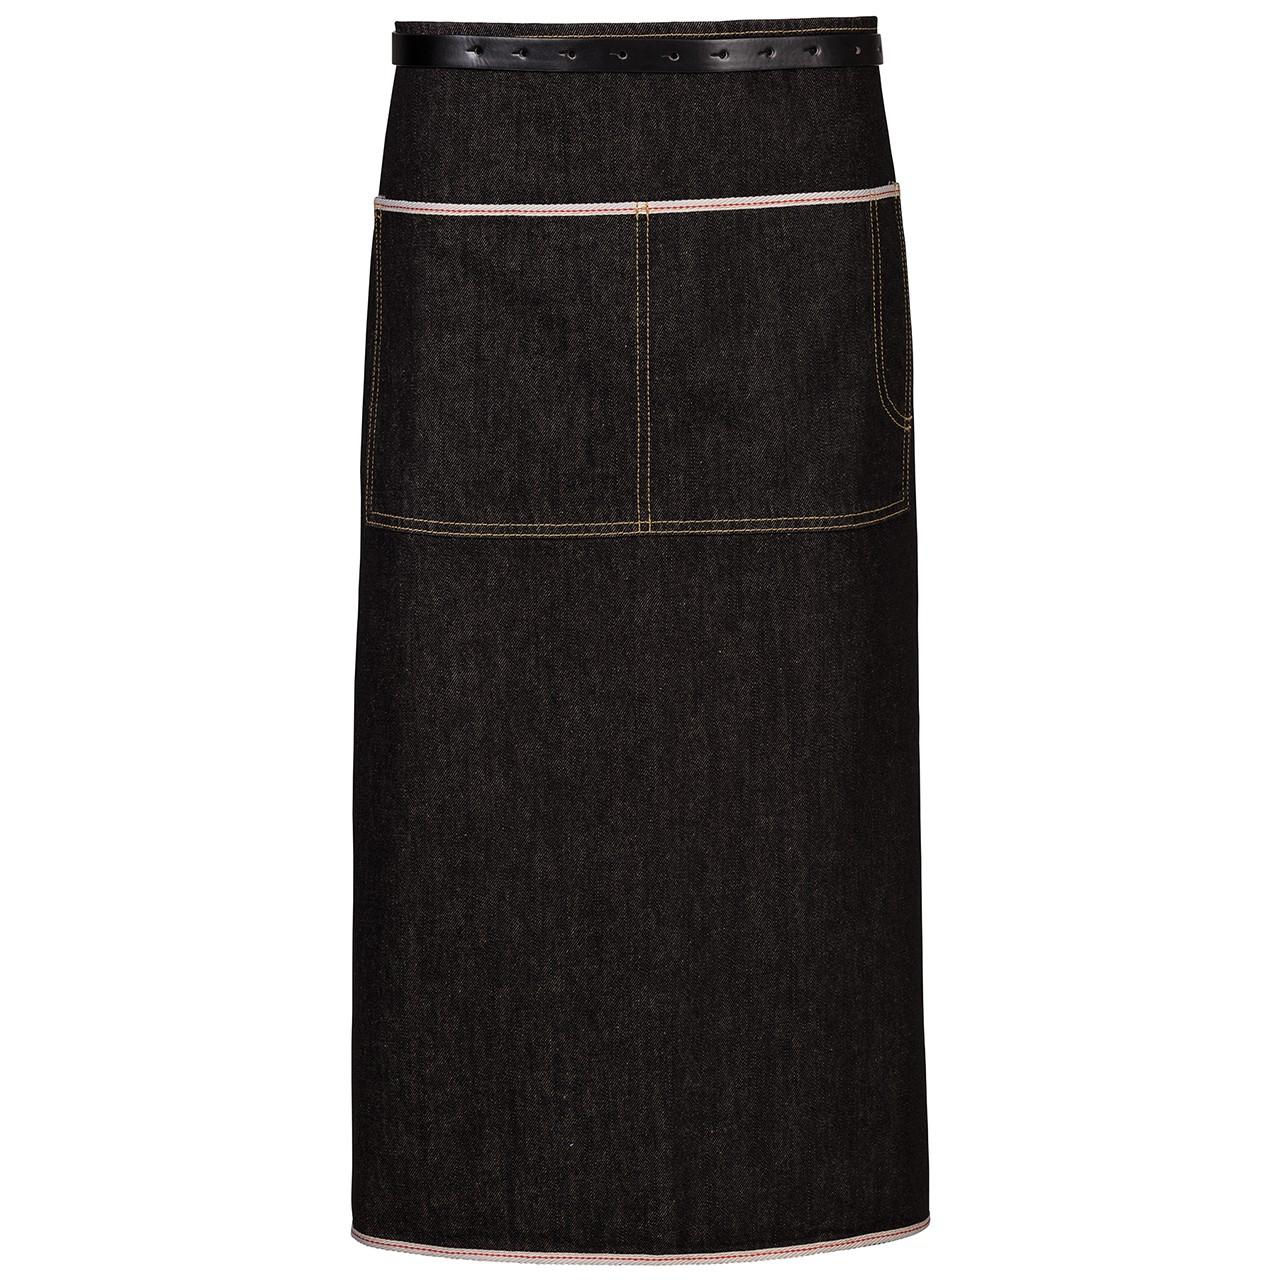 Kellnerschürze im Jeanslook mit Paspel Exner® | bedrucken, besticken, bedrucken lassen, besticken lassen, mit Logo |